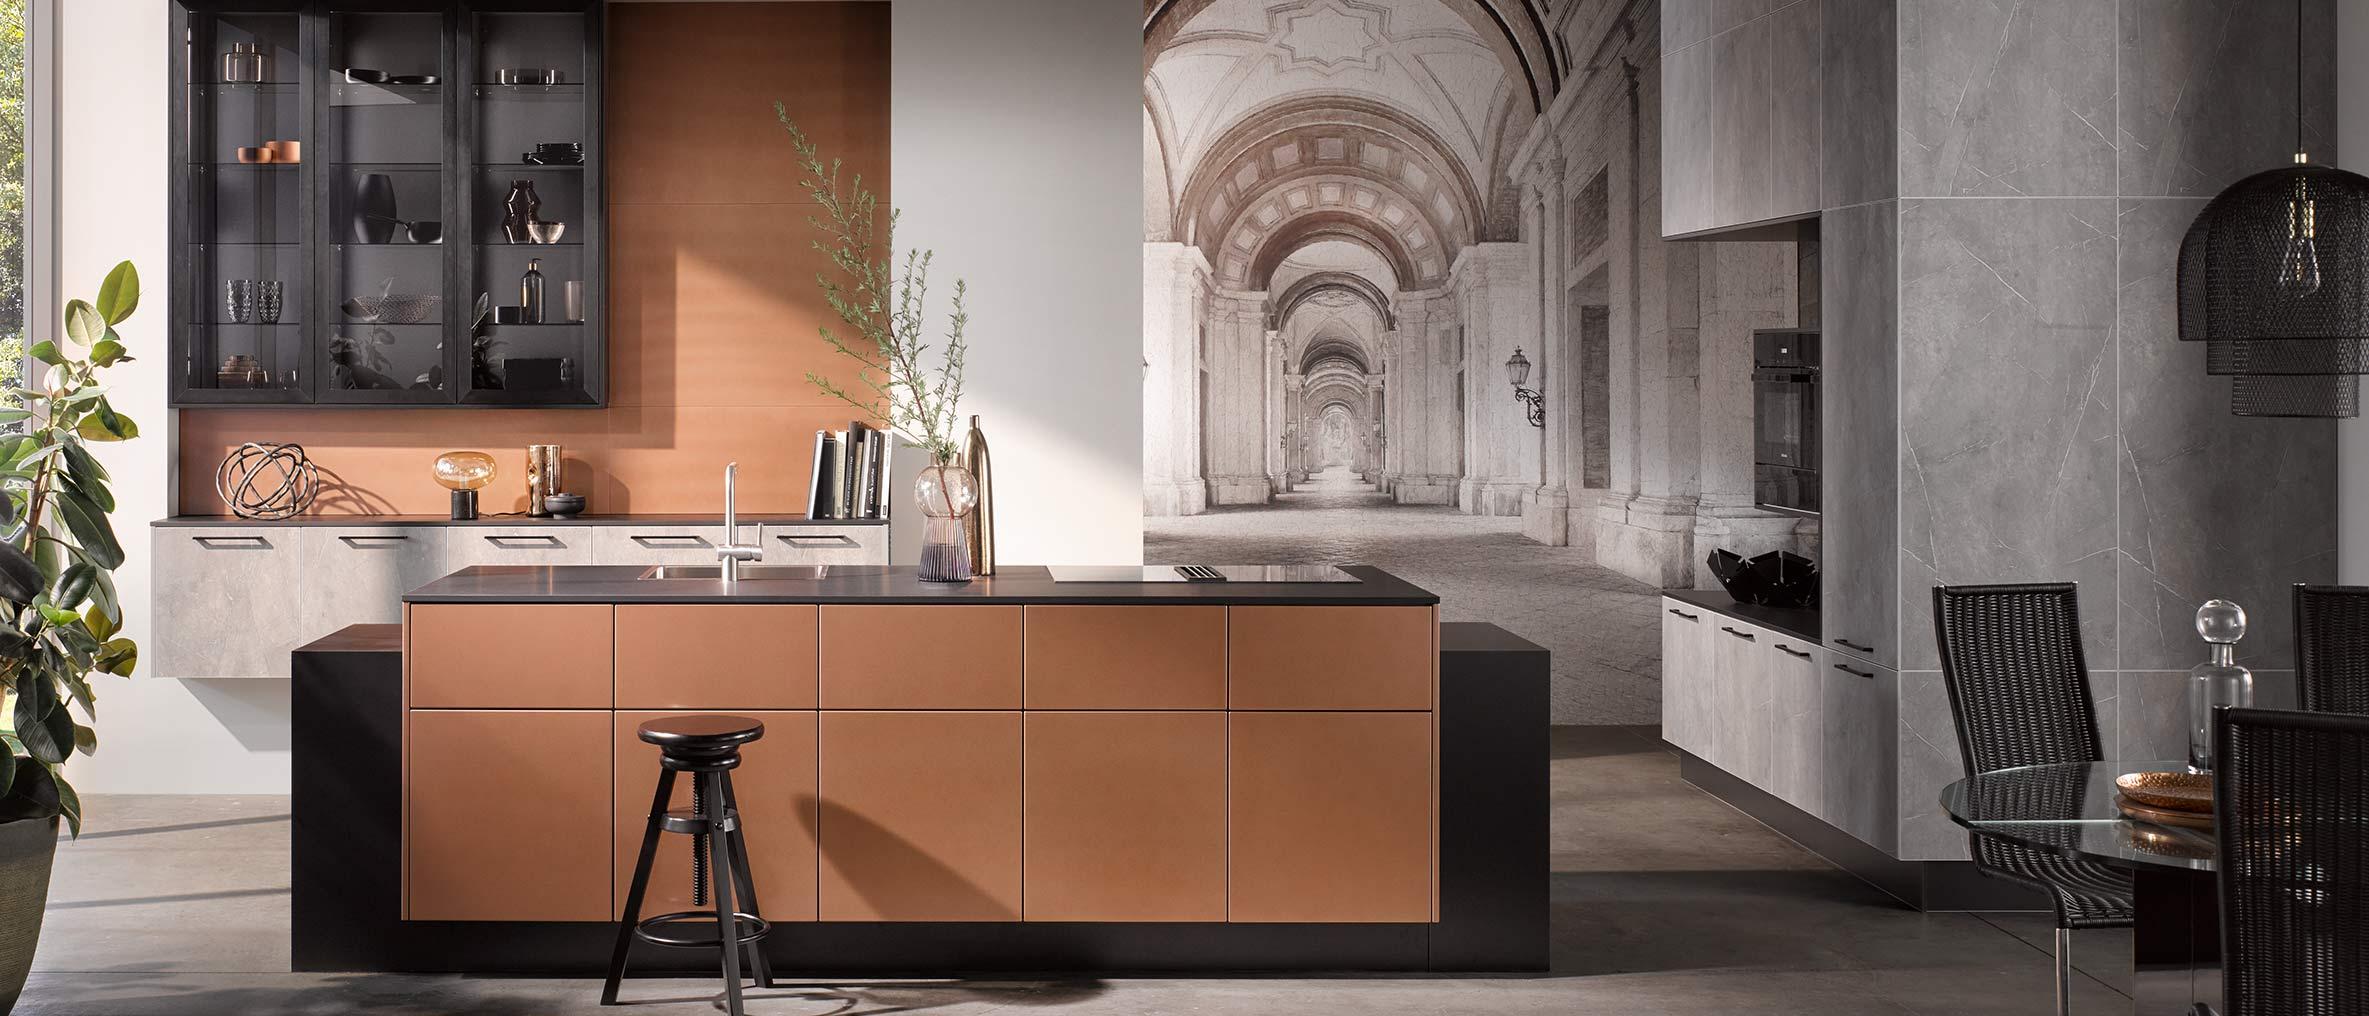 ultimate-luxury-details